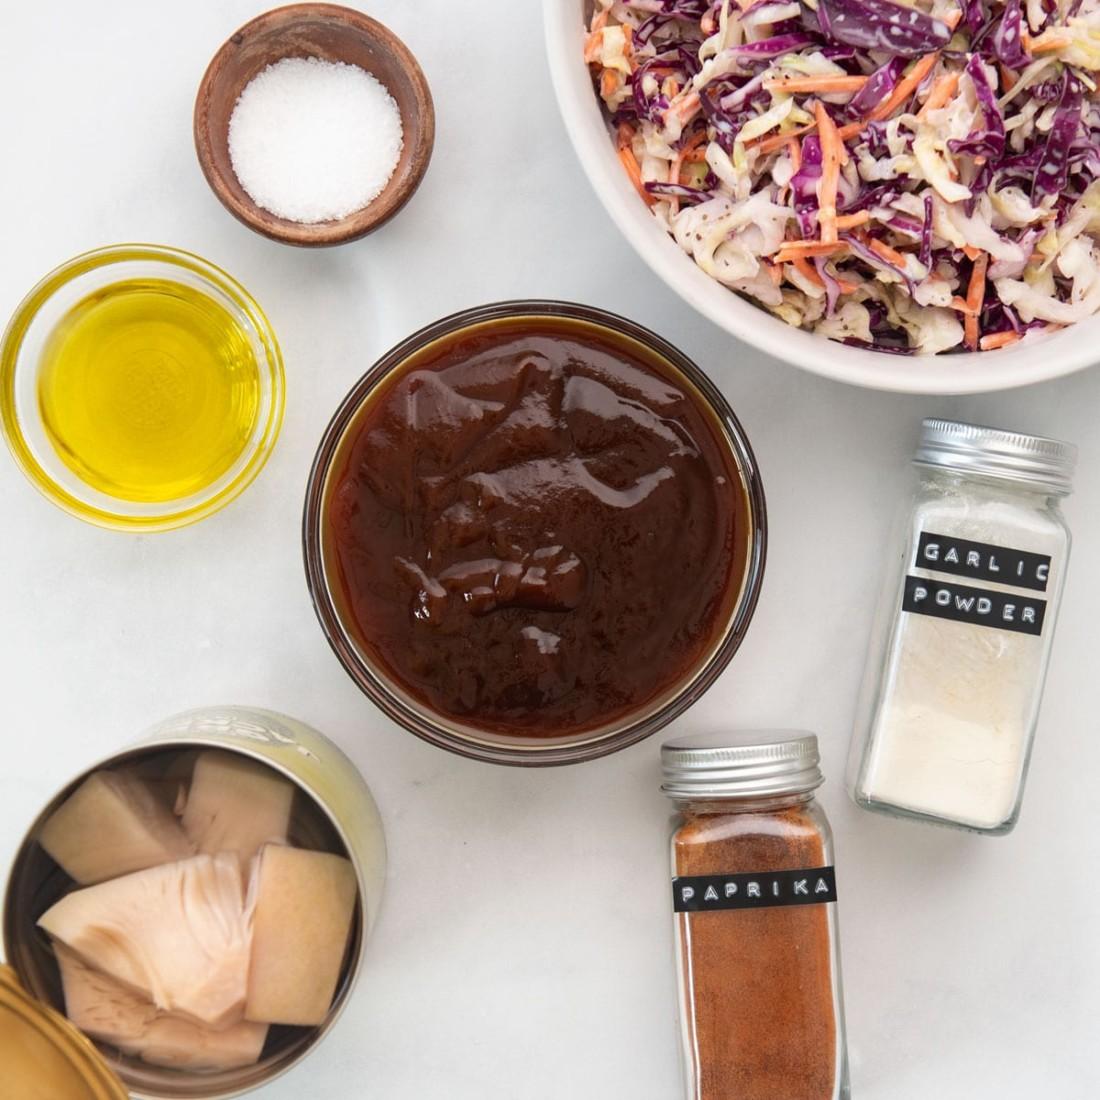 bbq sauce, coleslaw, jackfruit, and seasonings on white background